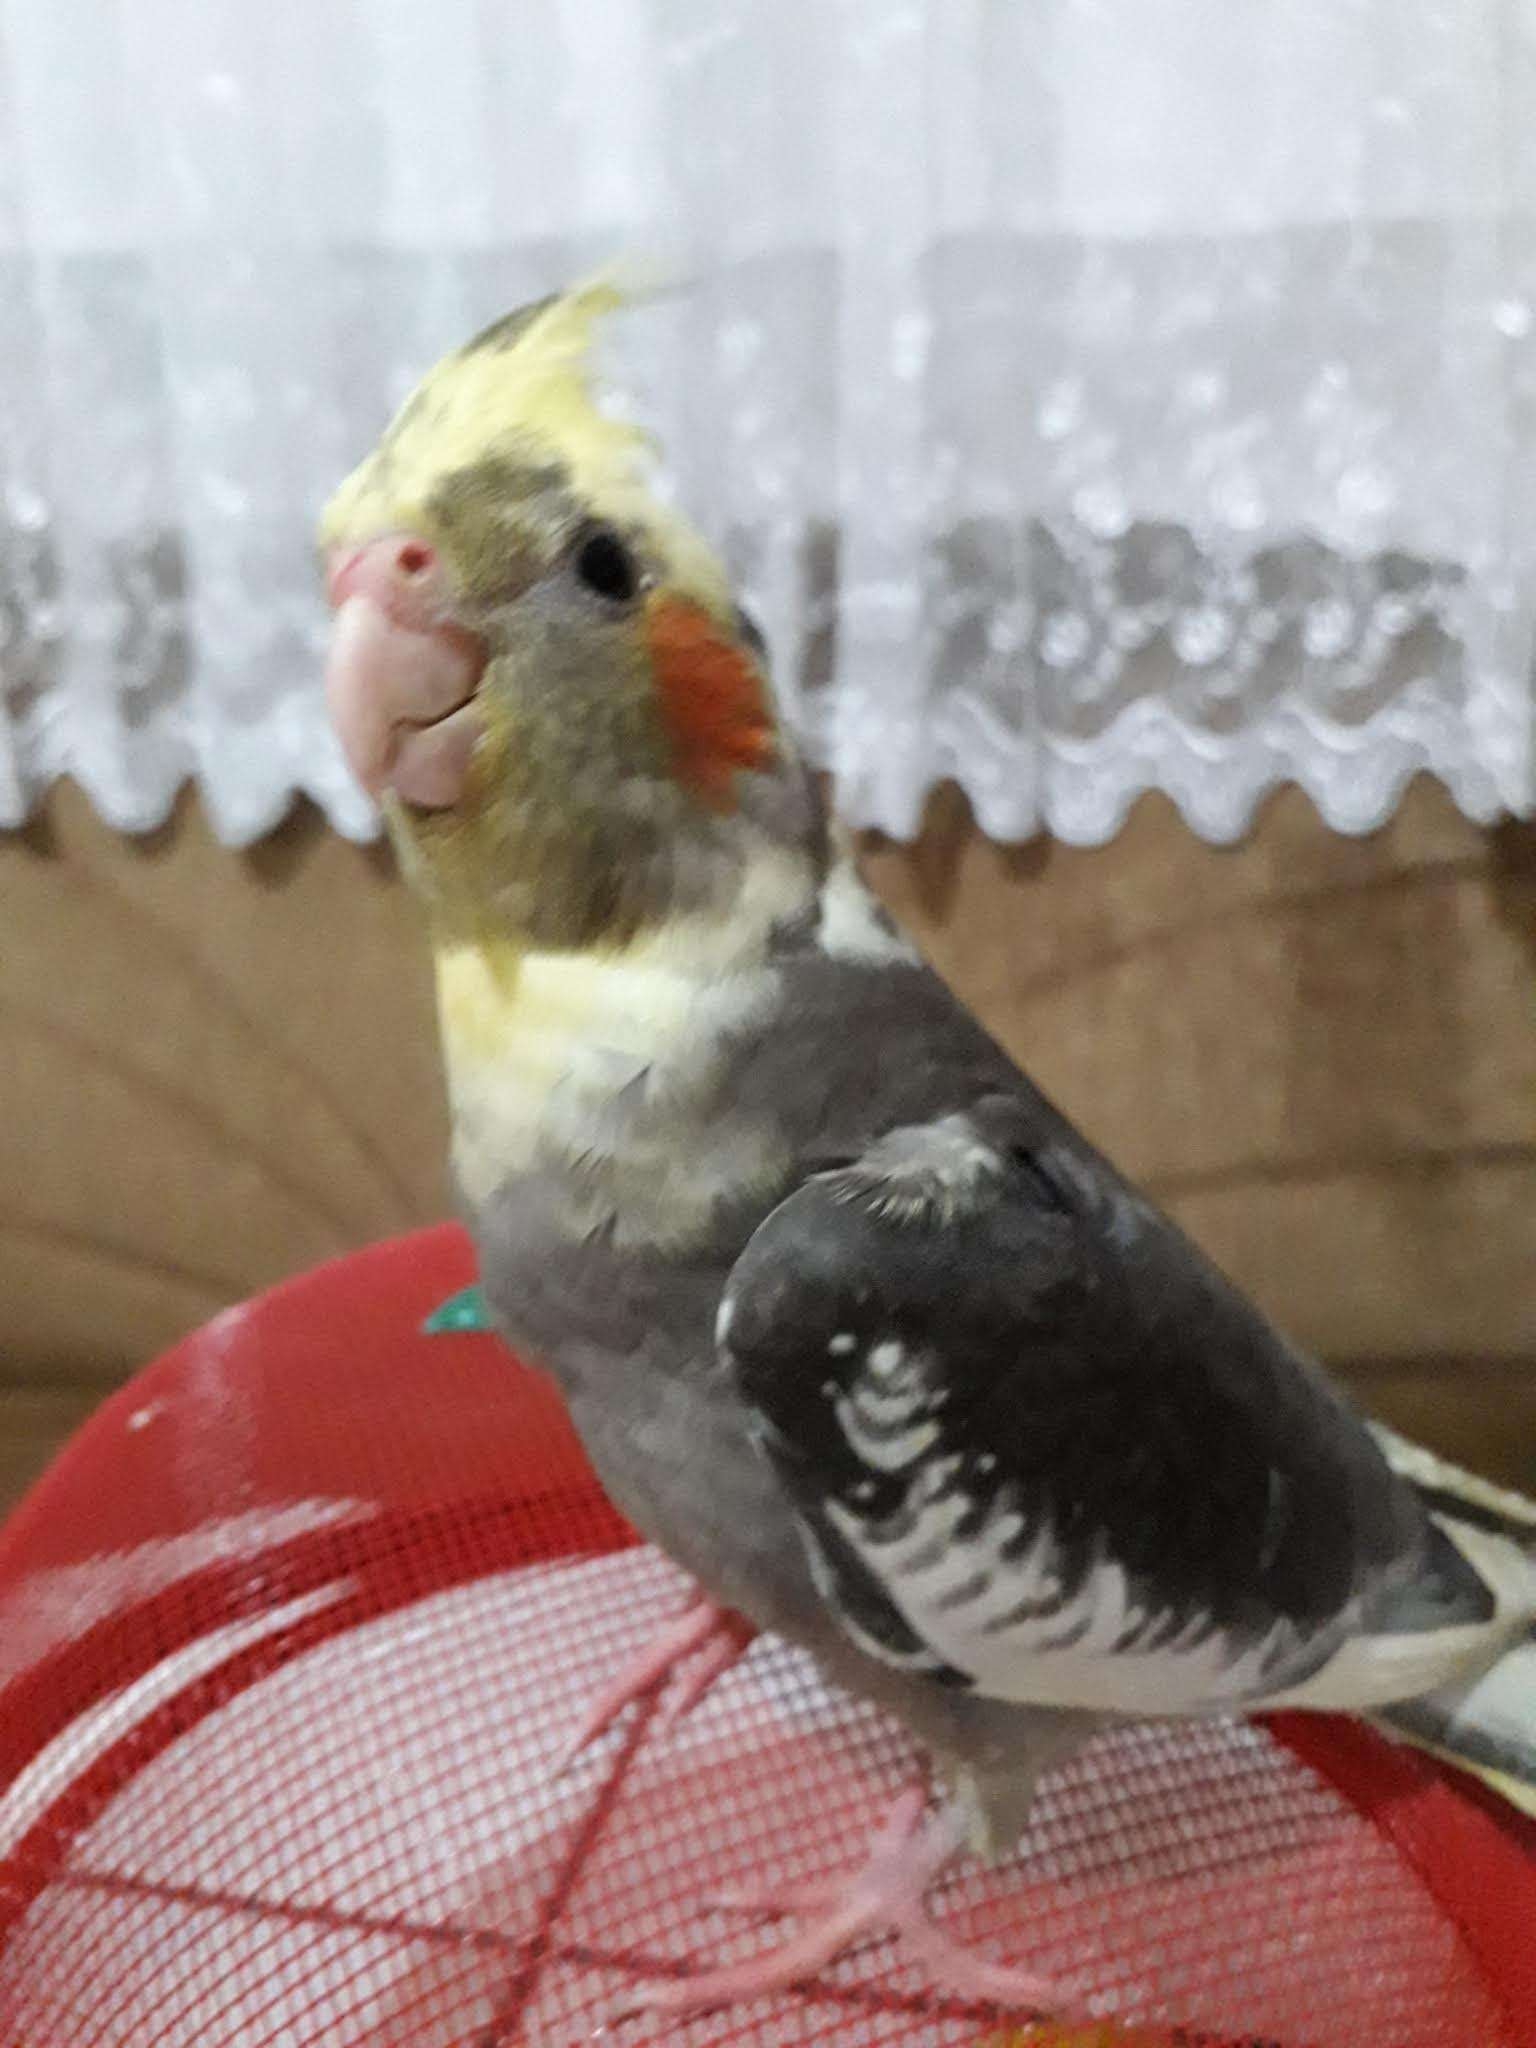 Sultan papağan şaşkın kayıp